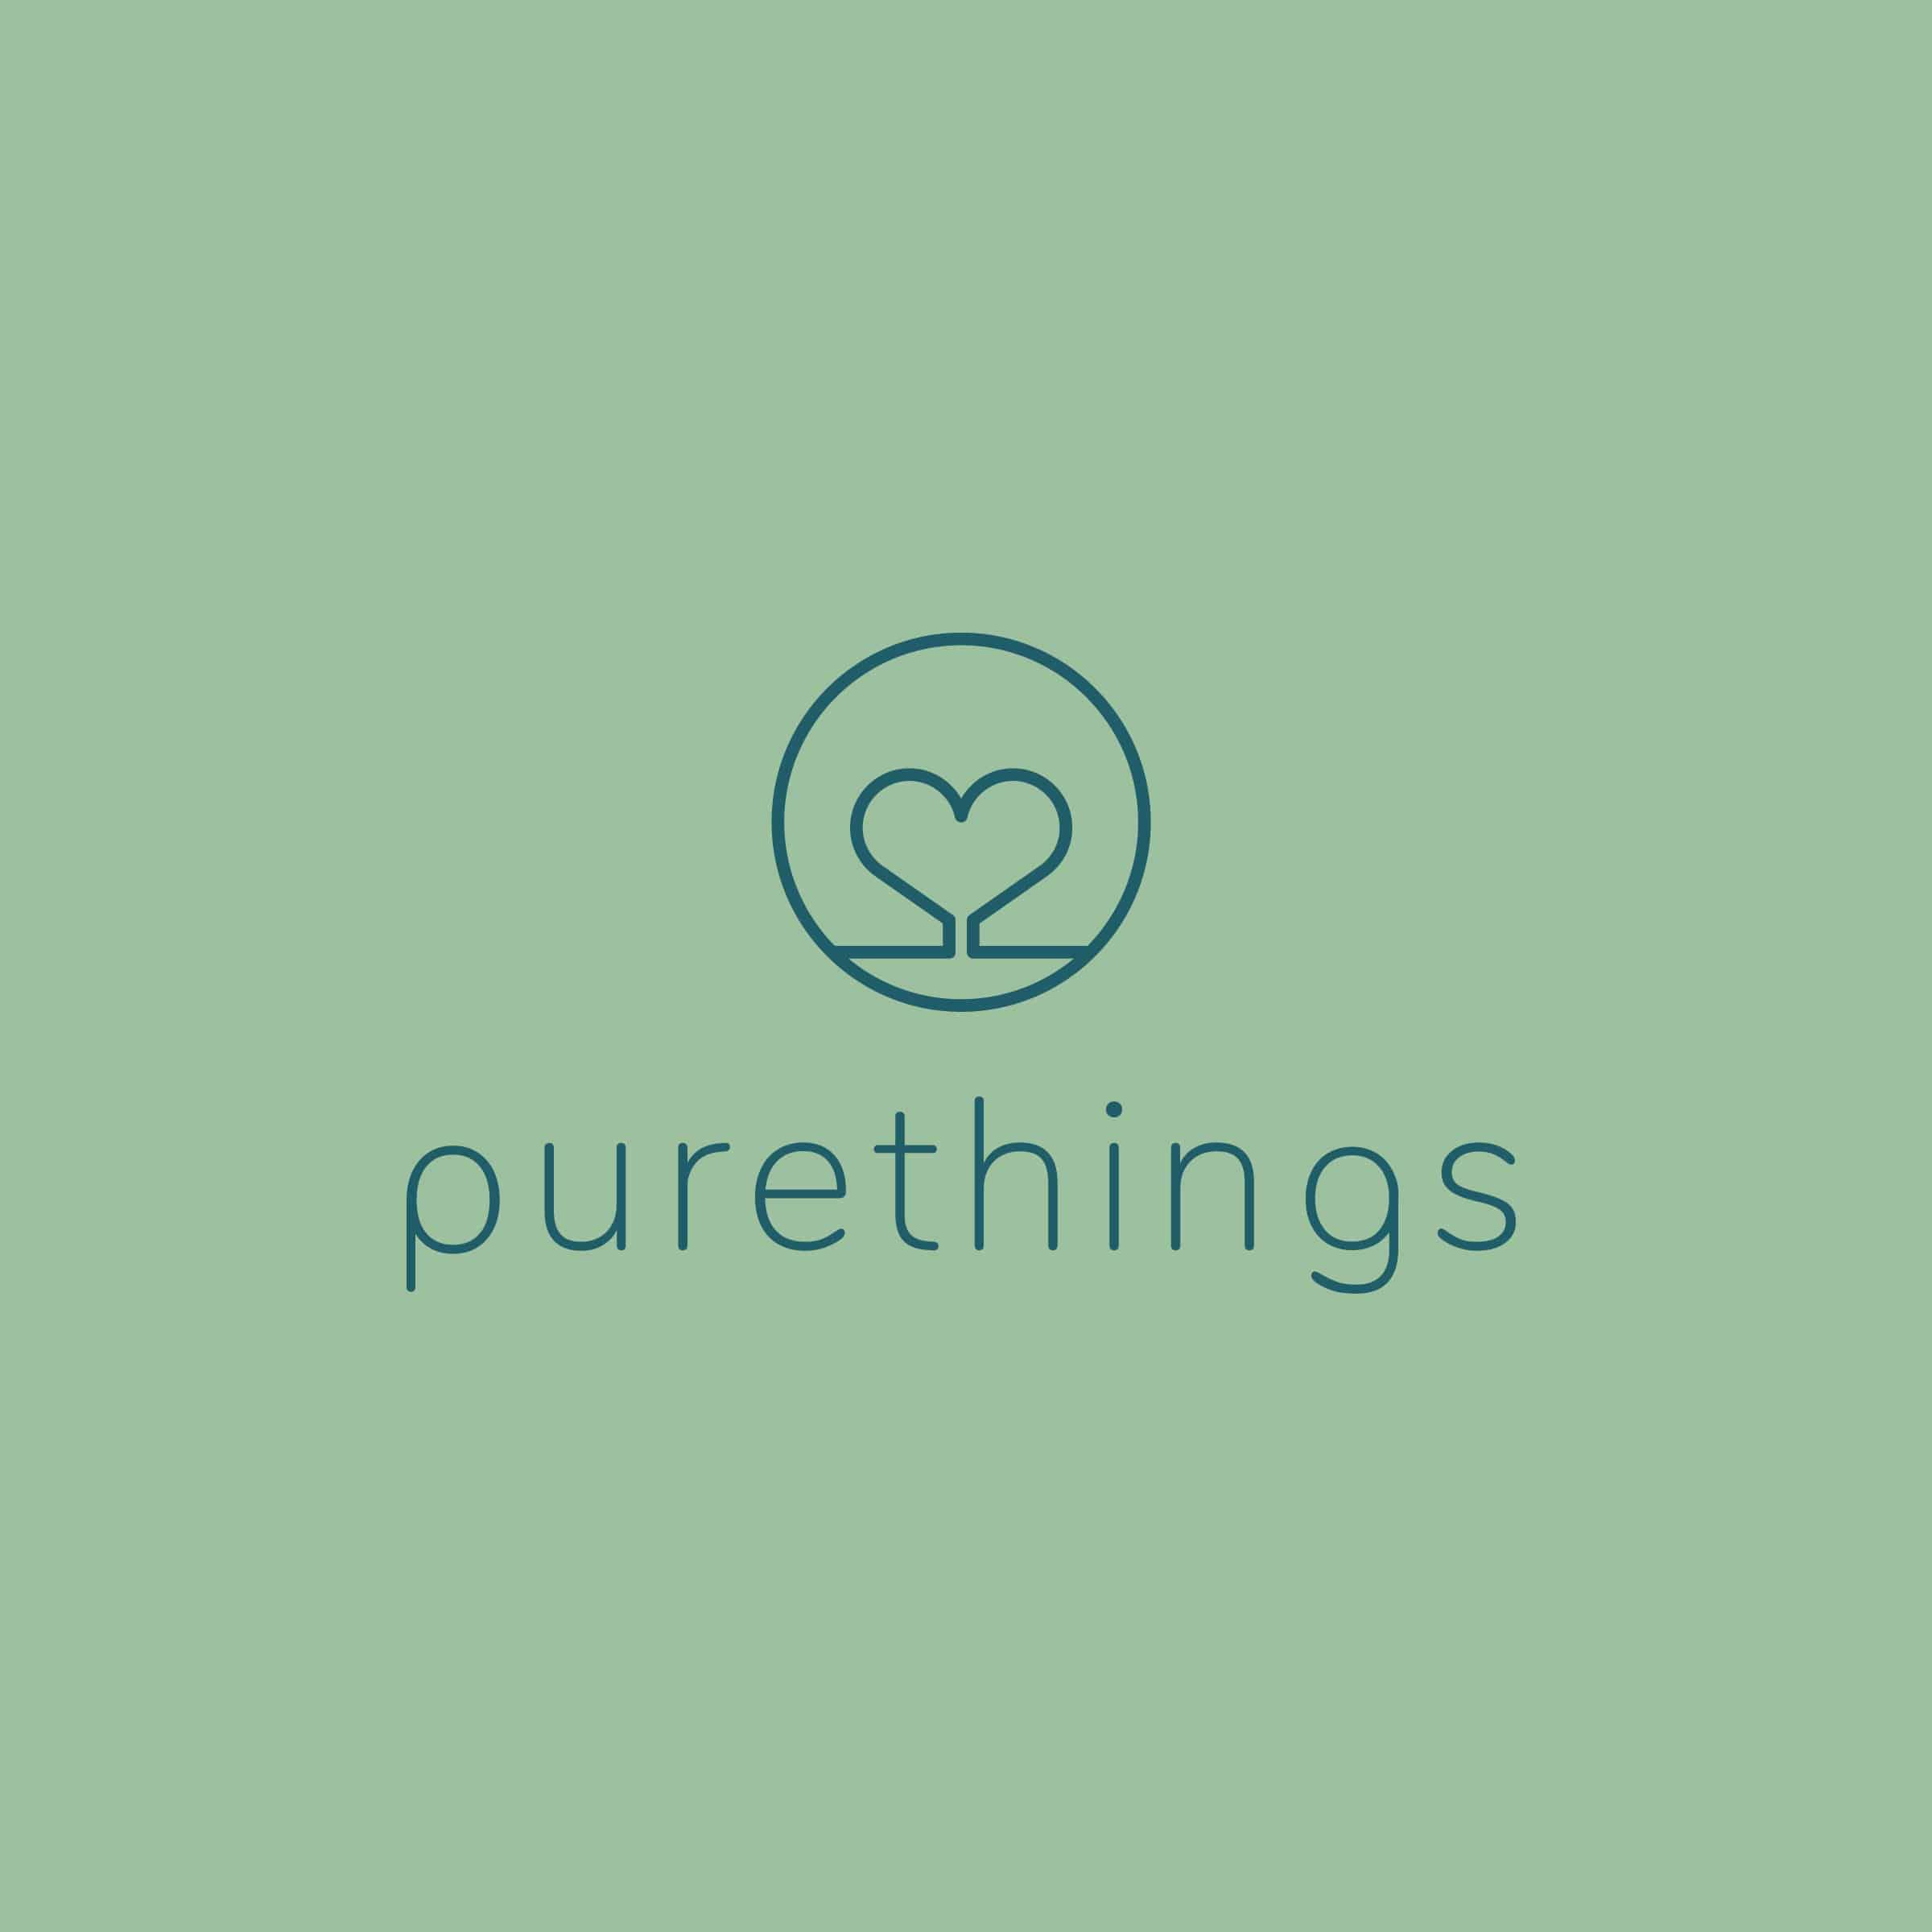 Purethings Logo